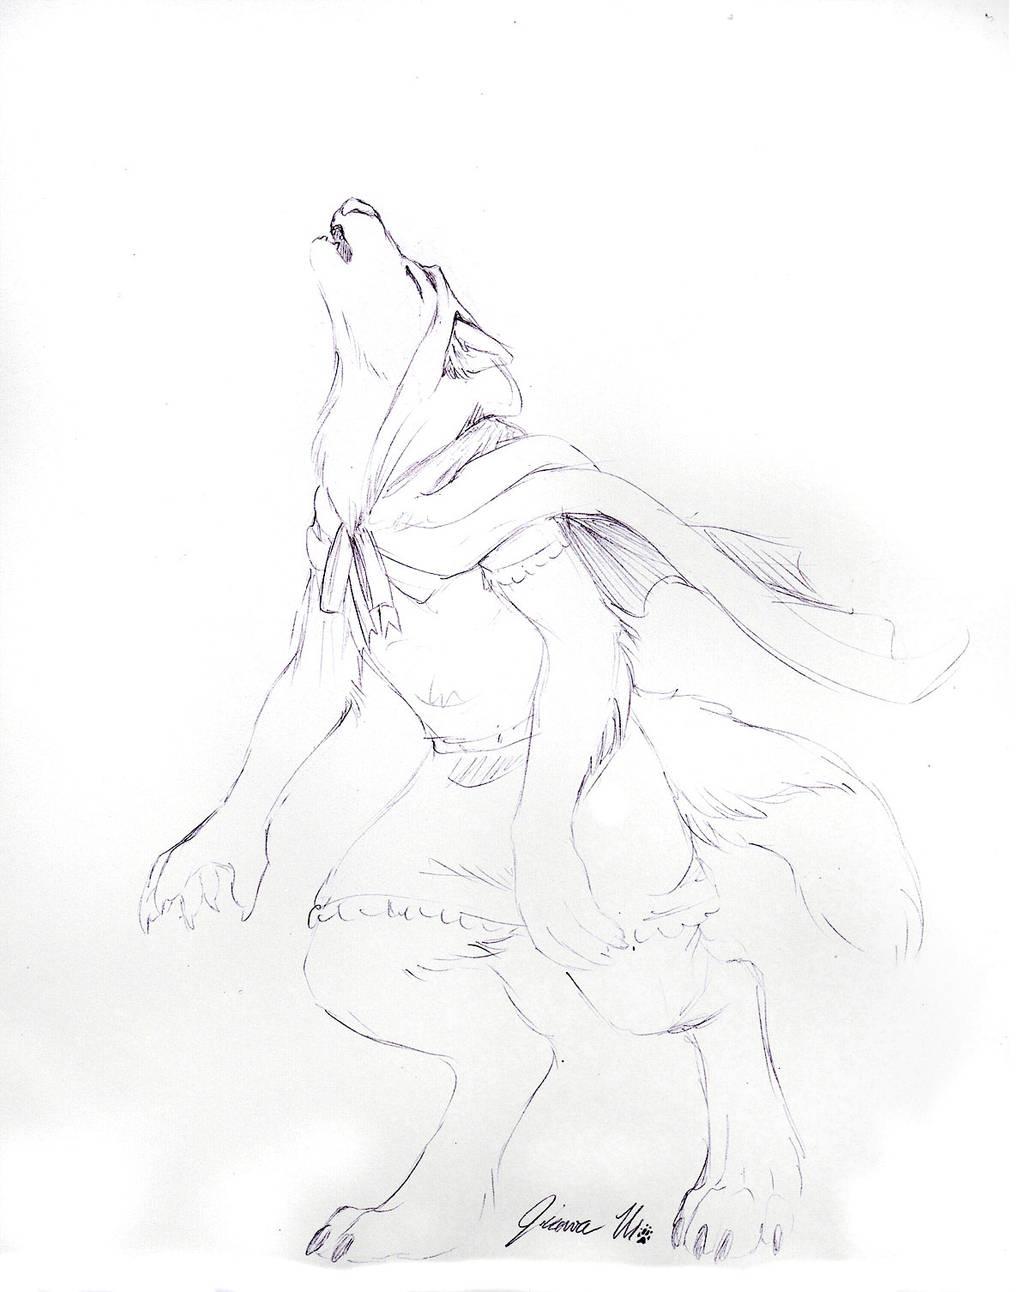 Sketch Request - Red Riding Werewolf by Jianre-M